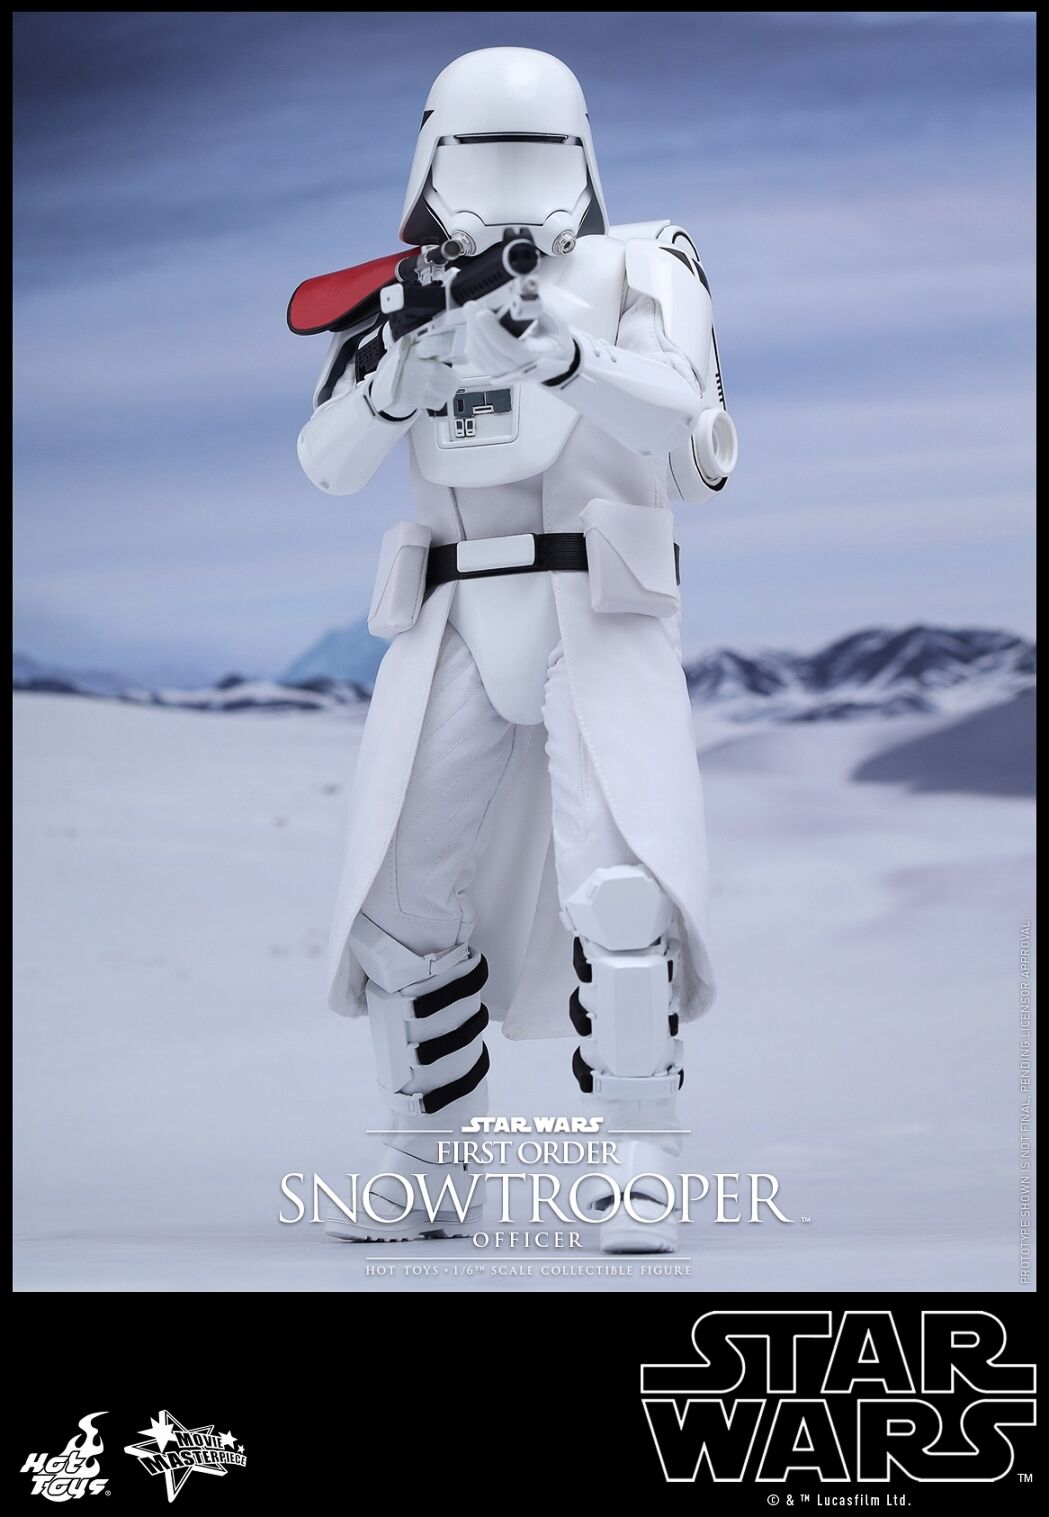 Hot Toys 1 6 Star Wars MMS322 primera orden Snowtroopers oficial Ver Figura De Acción